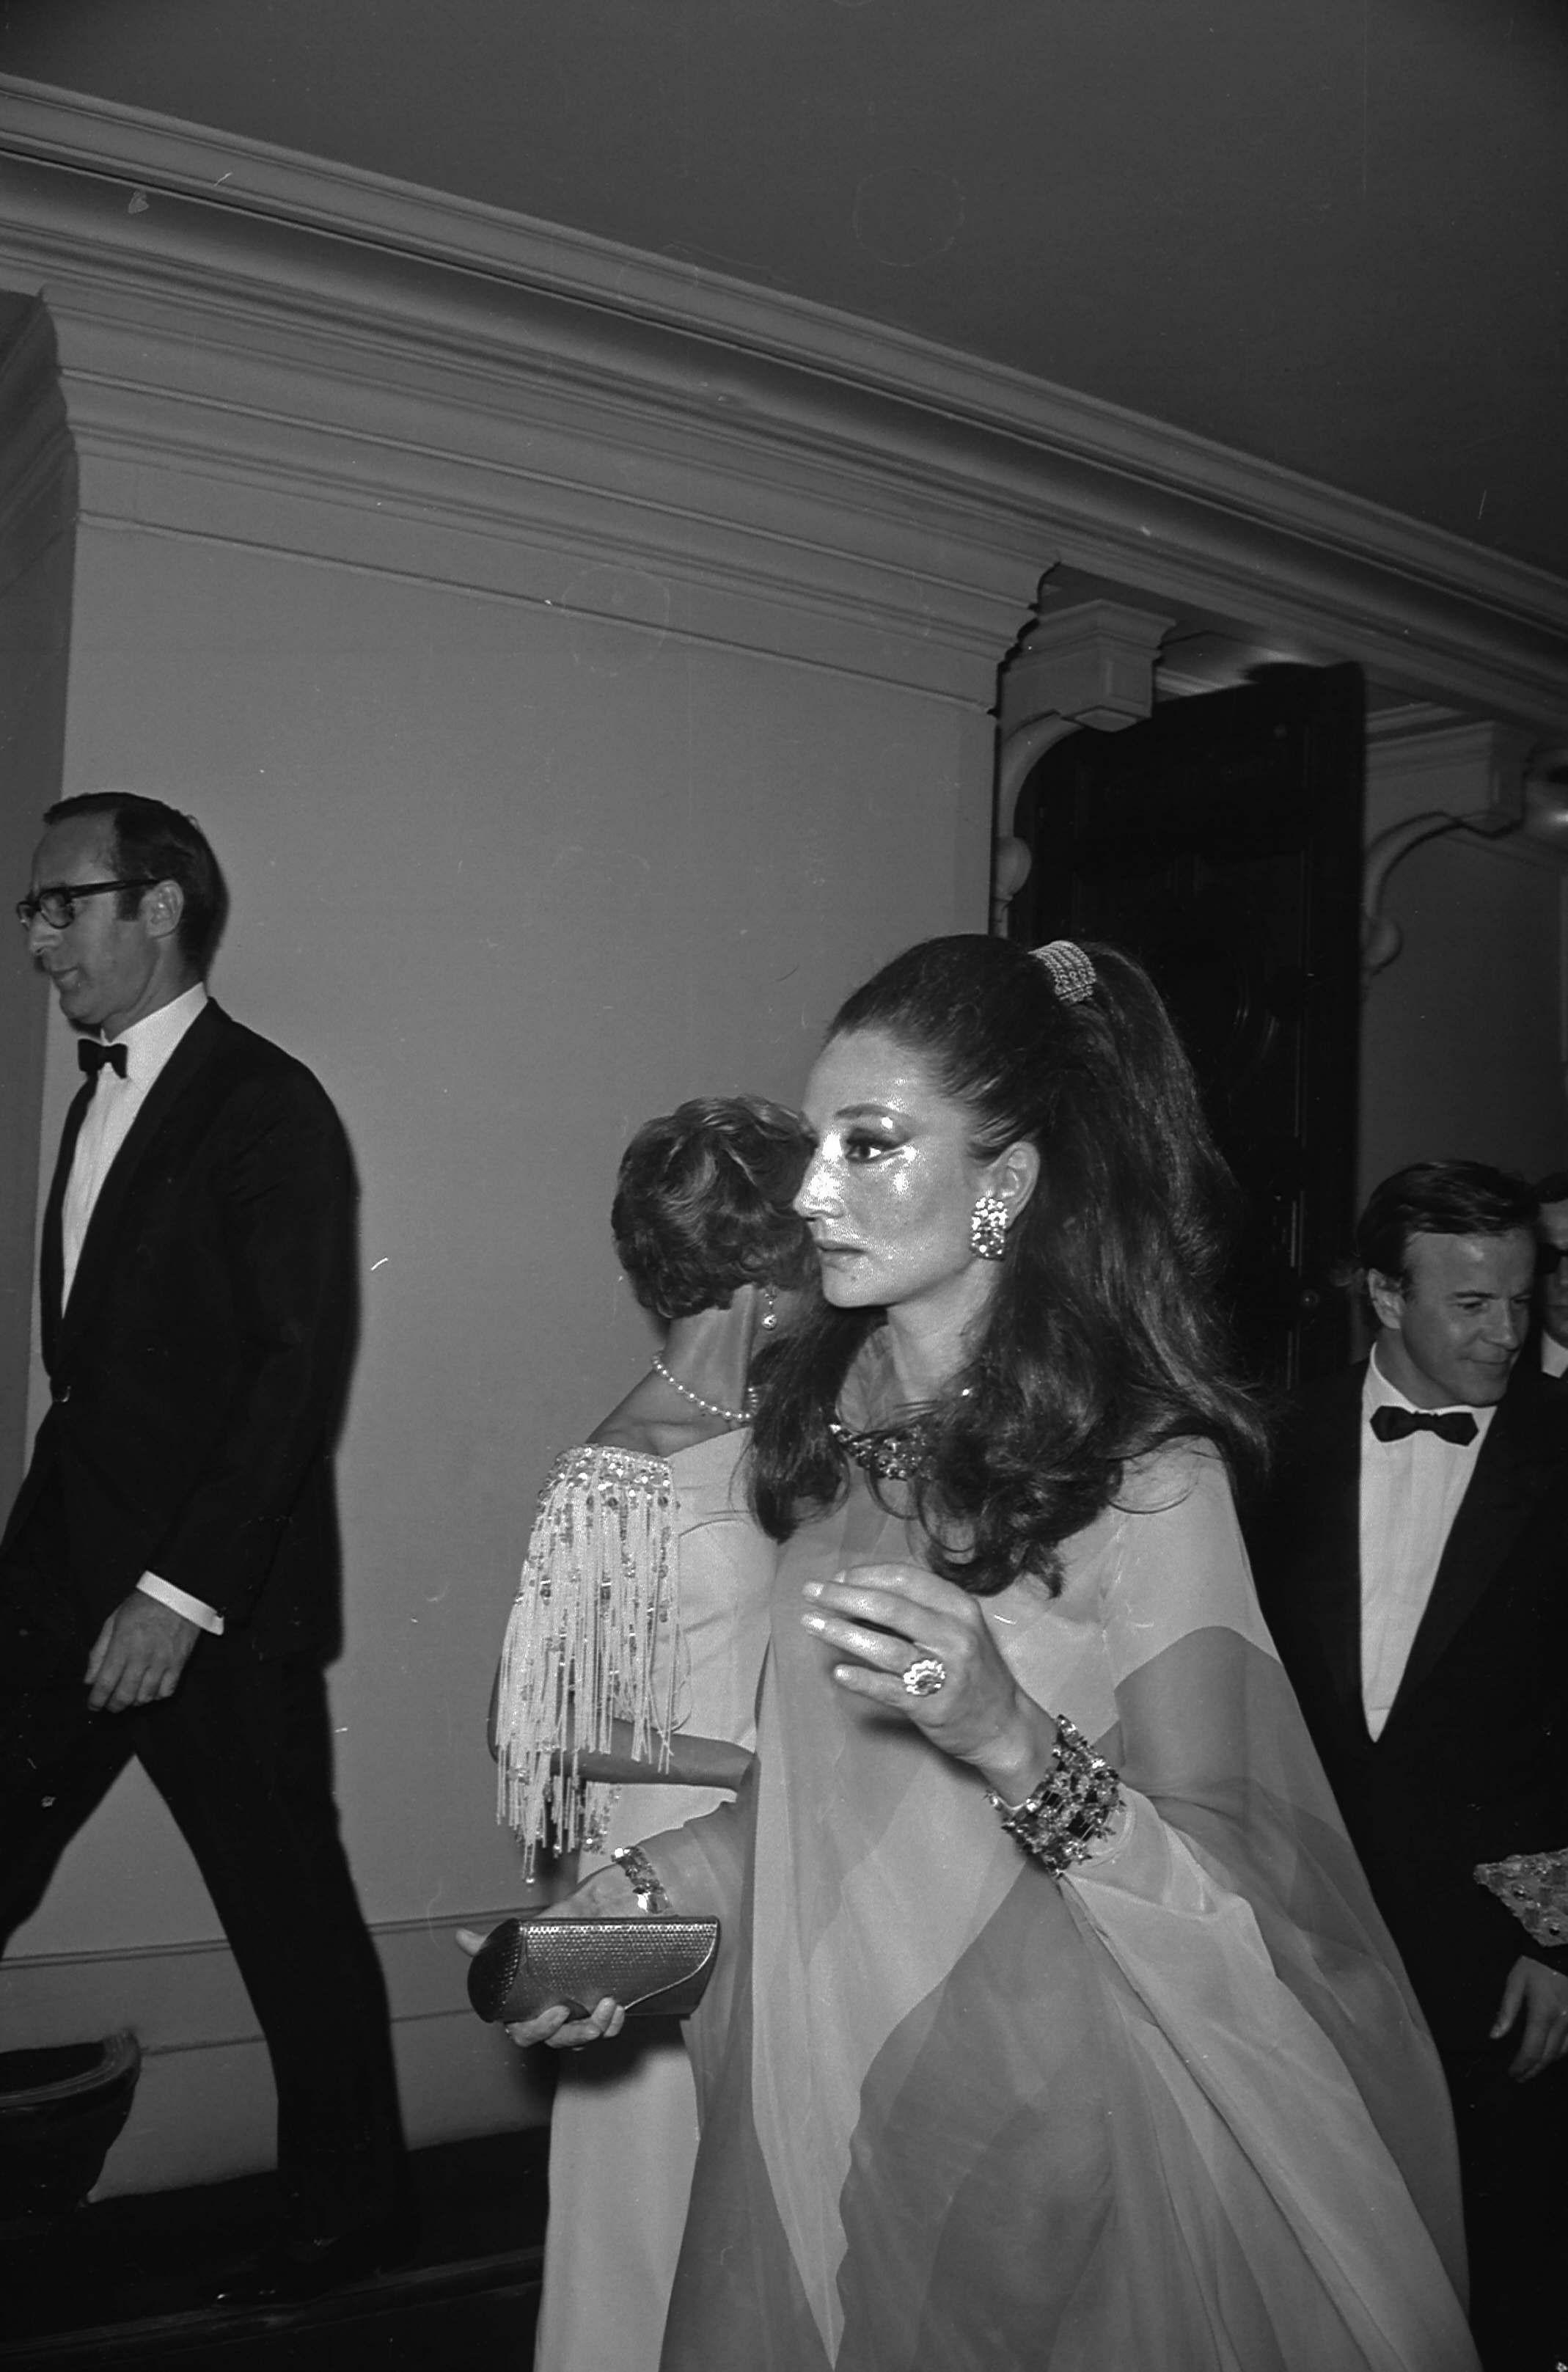 Jacqueline de Ribes in 1965.